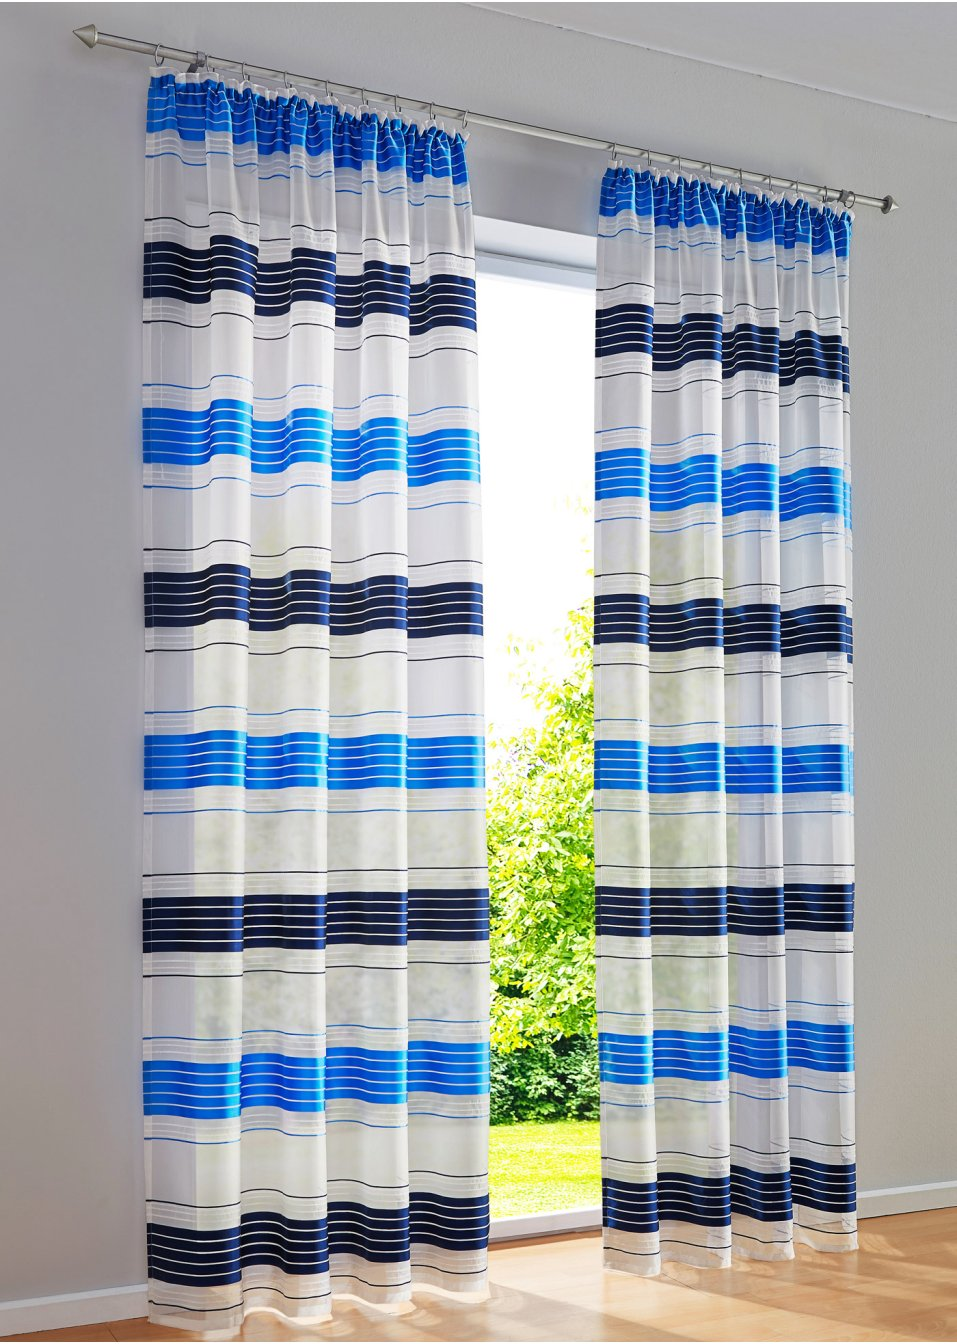 Bonprix Gardinen » Bonprix Gardinen Blau - Gardinen Dekoration ...